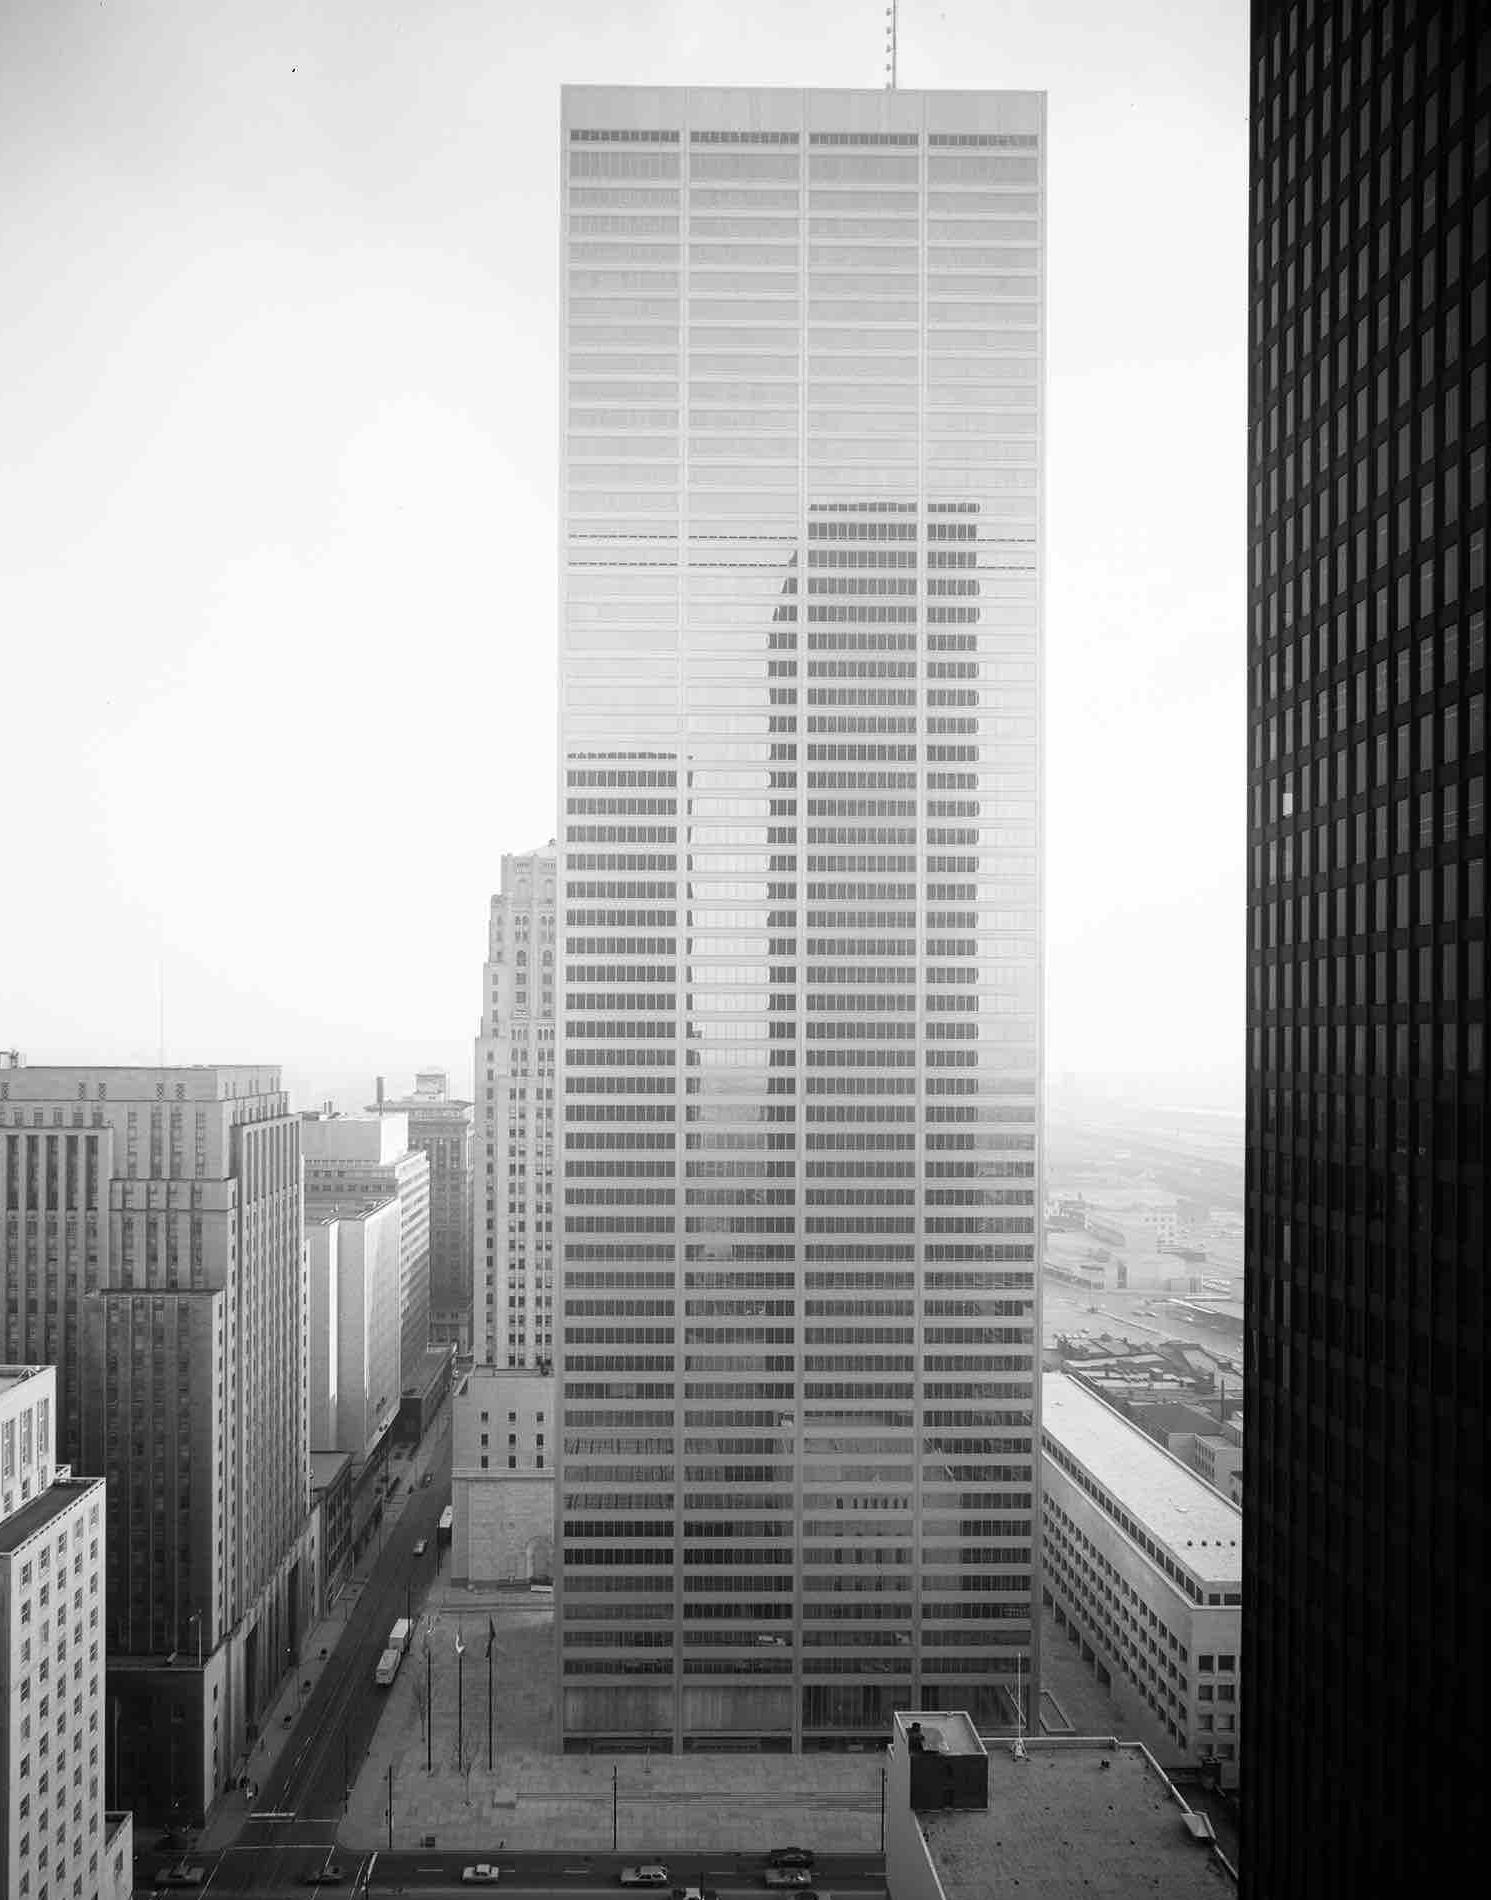 Mies_Chicago_45bn1792_hdr26 copy.jpeg